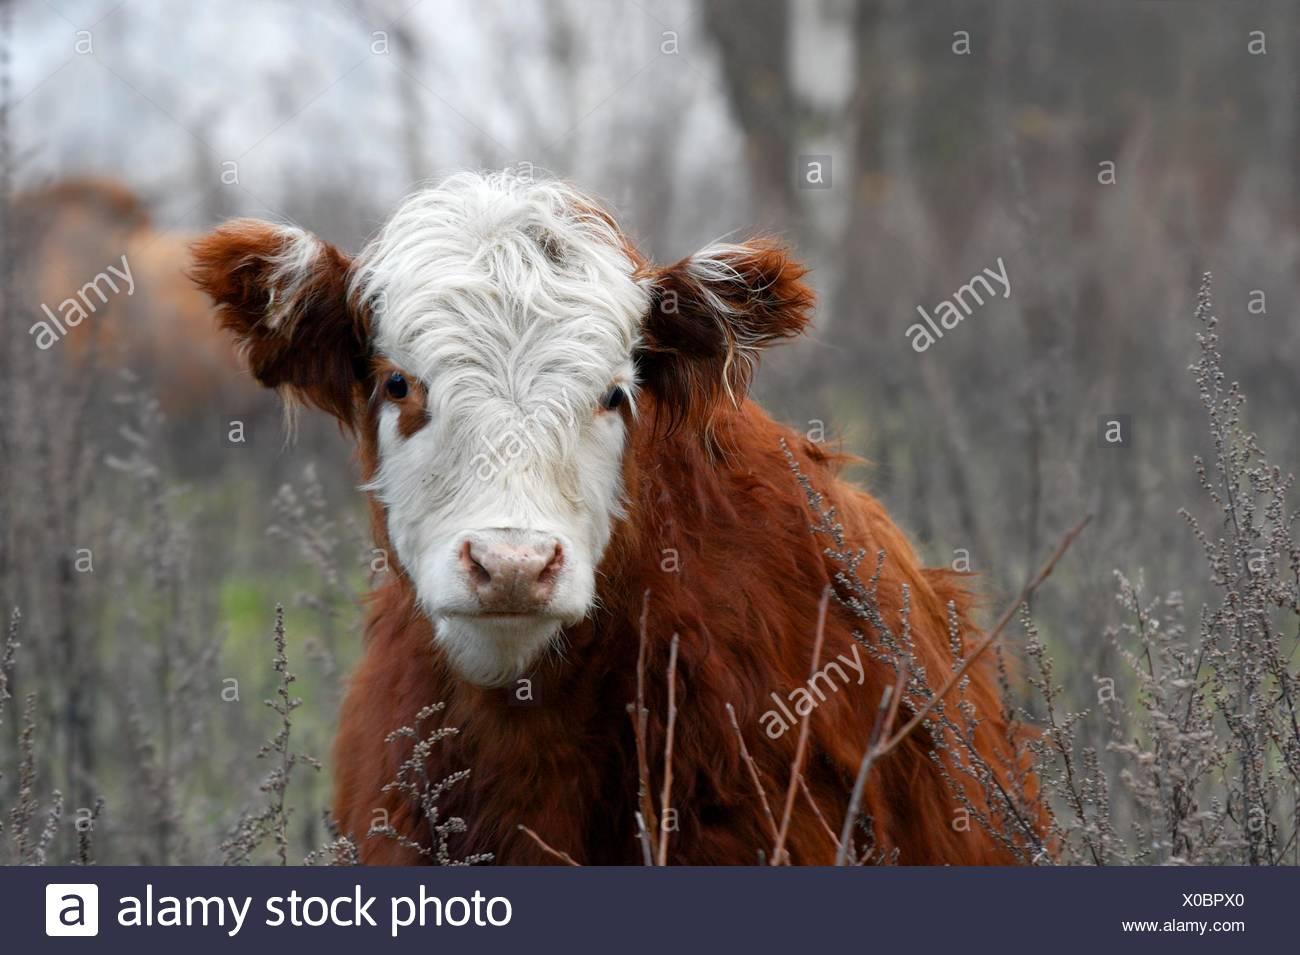 animal, mammal, brown, brownish, brunette, hairy, cow, beast ...